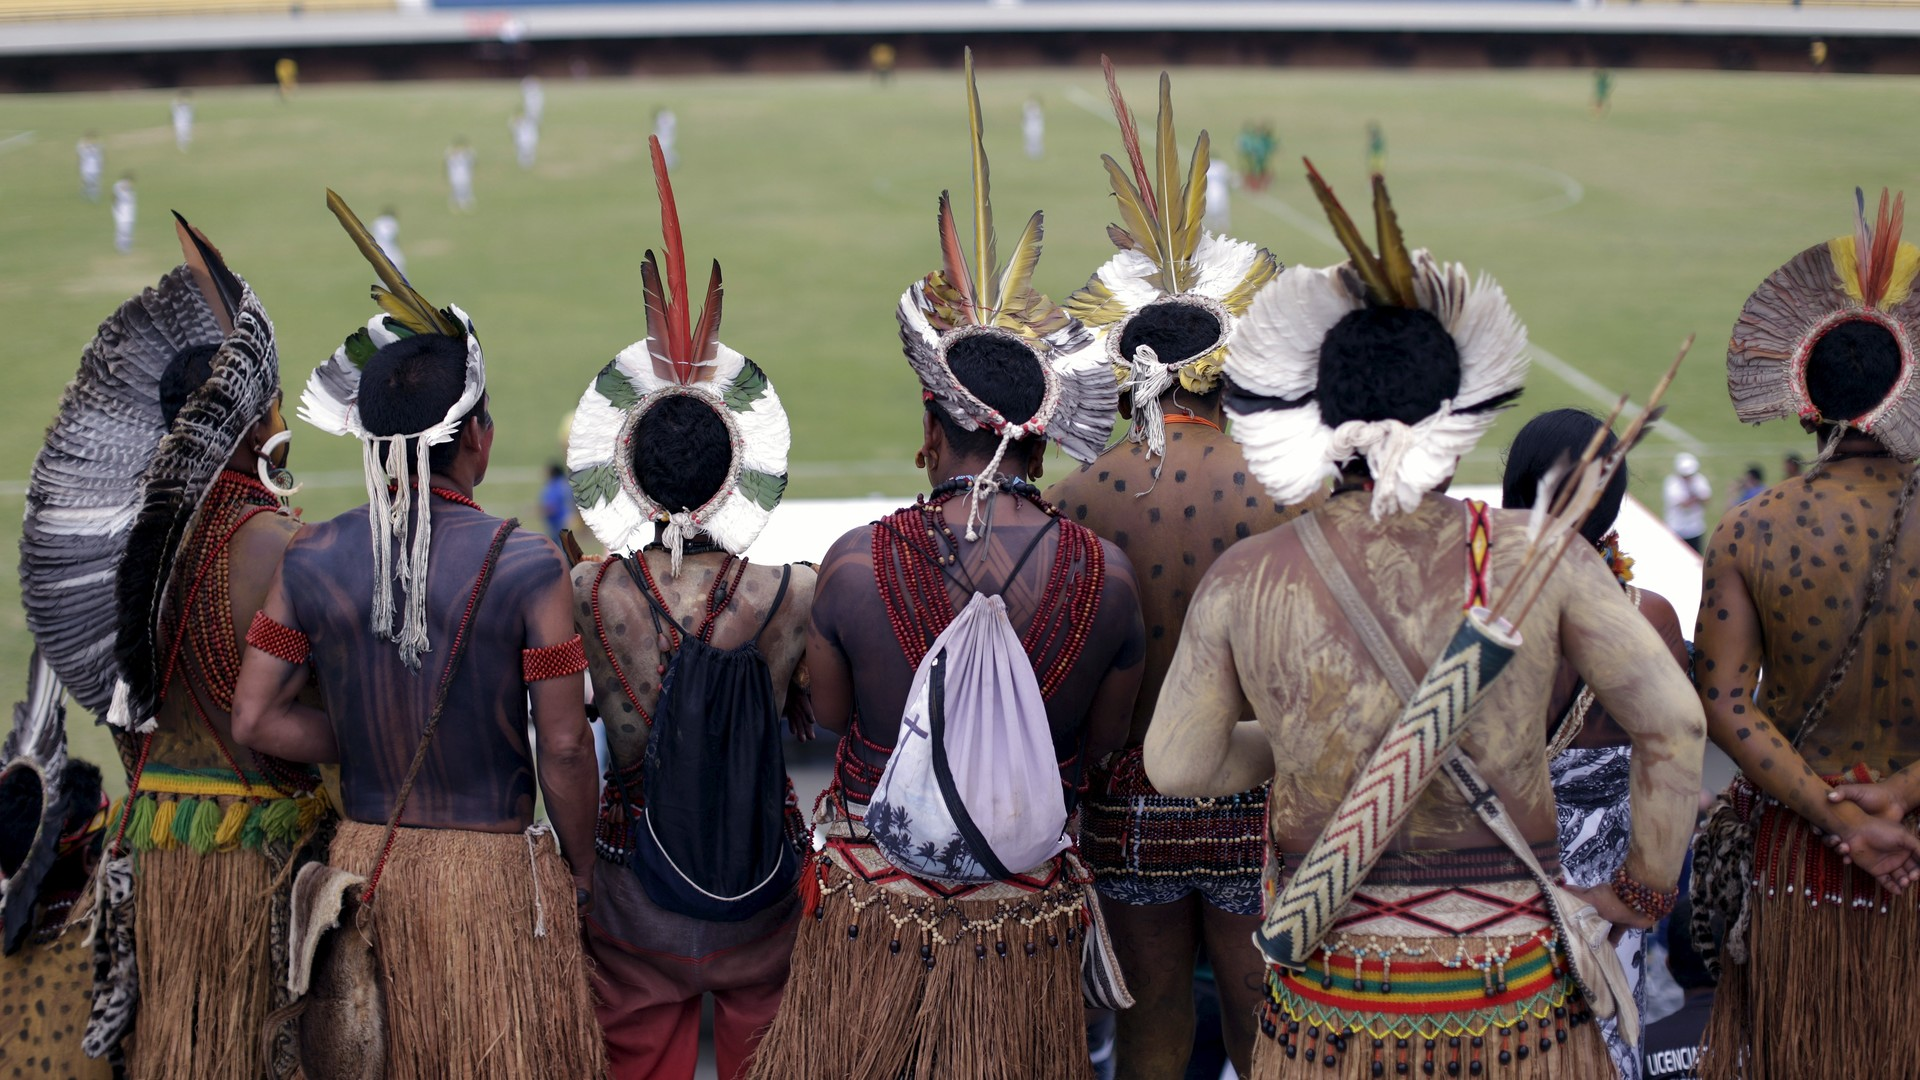 Des autochtones de la tribu Pataxo se mesurent au football contre la tribu Xerente